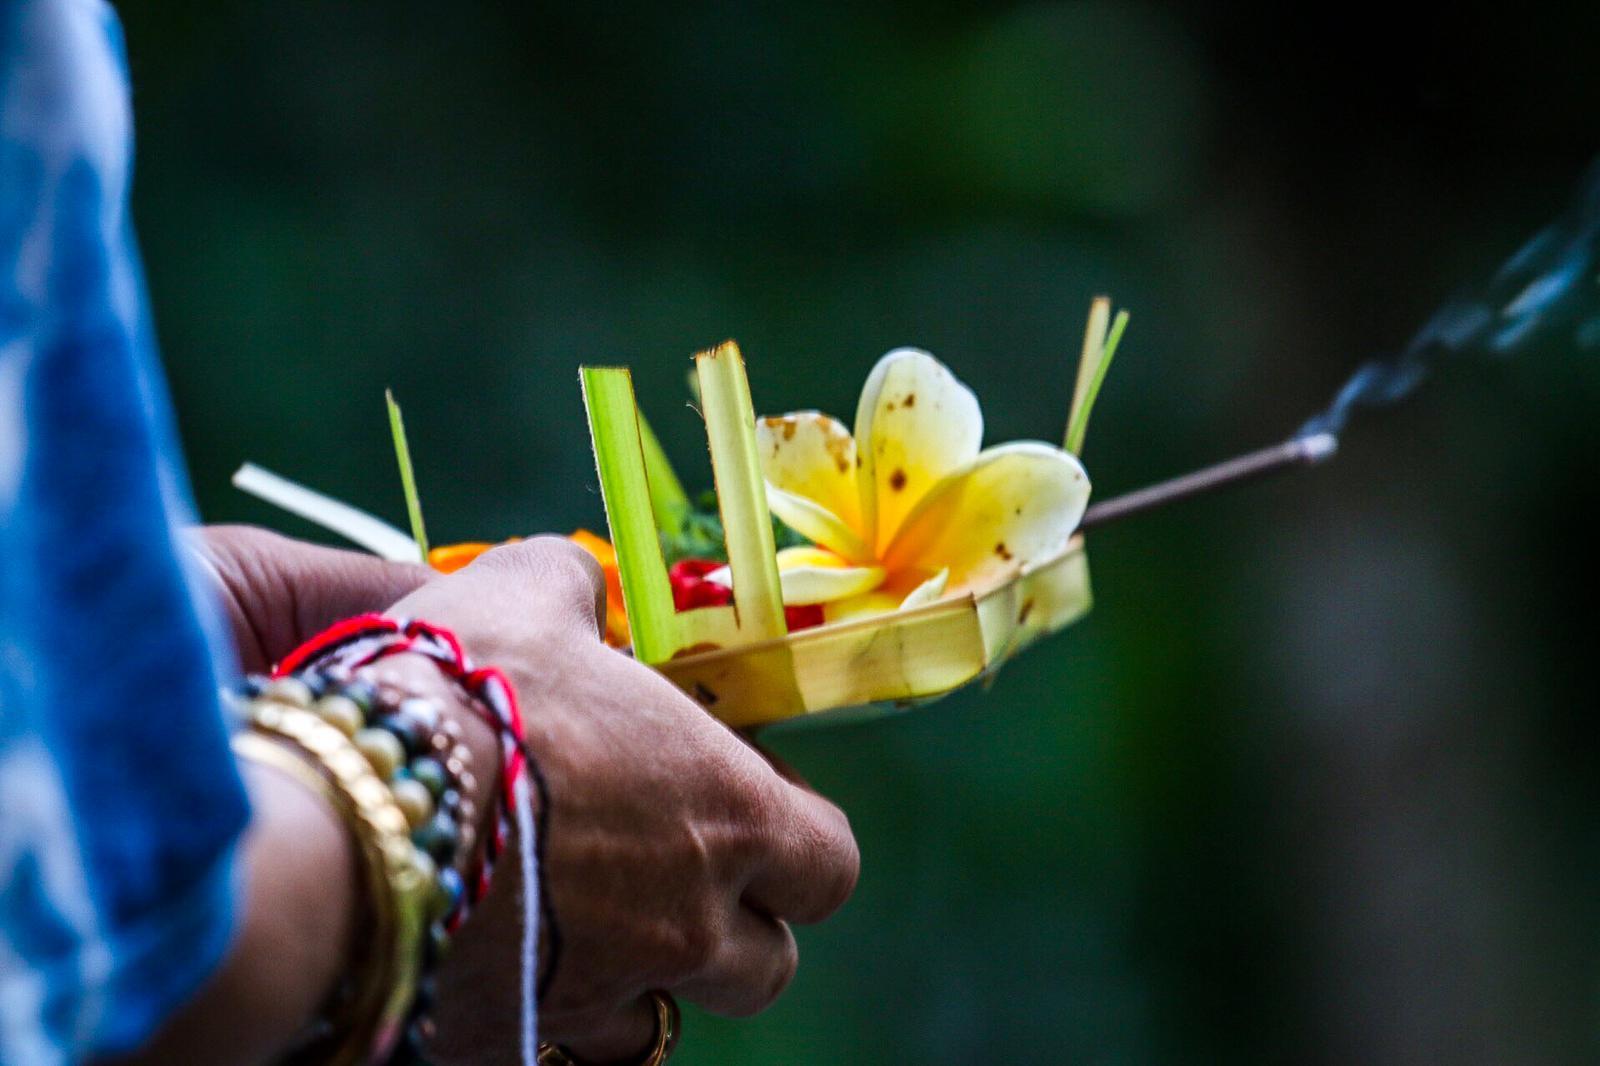 Canang Sari Offering